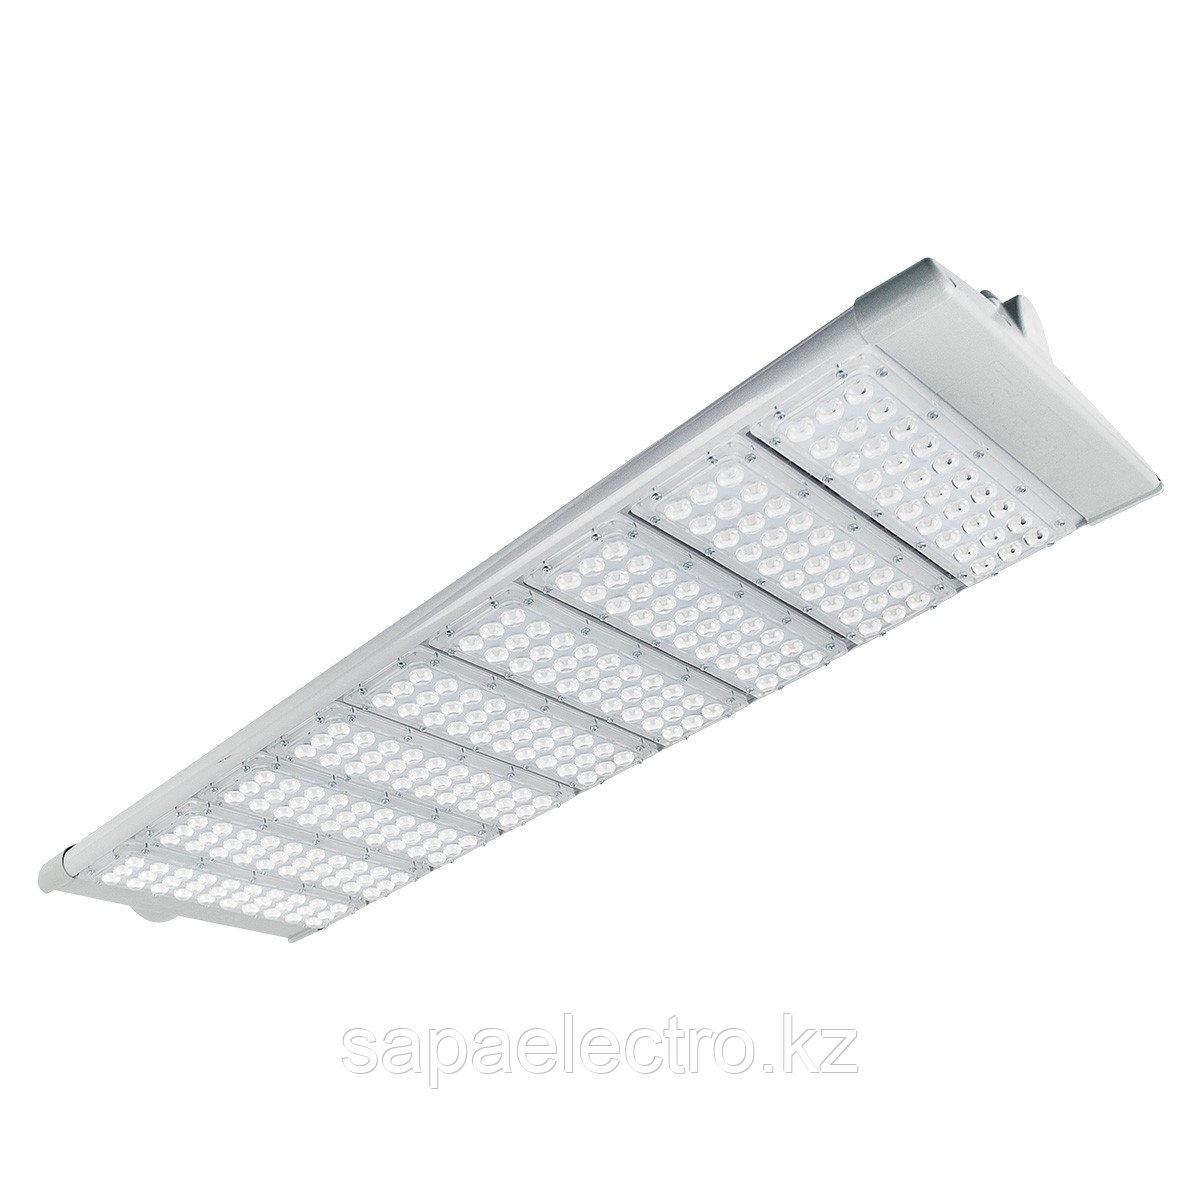 Свет-к RKU LED SMART  2*60W+3*50W (3 года гарантия)